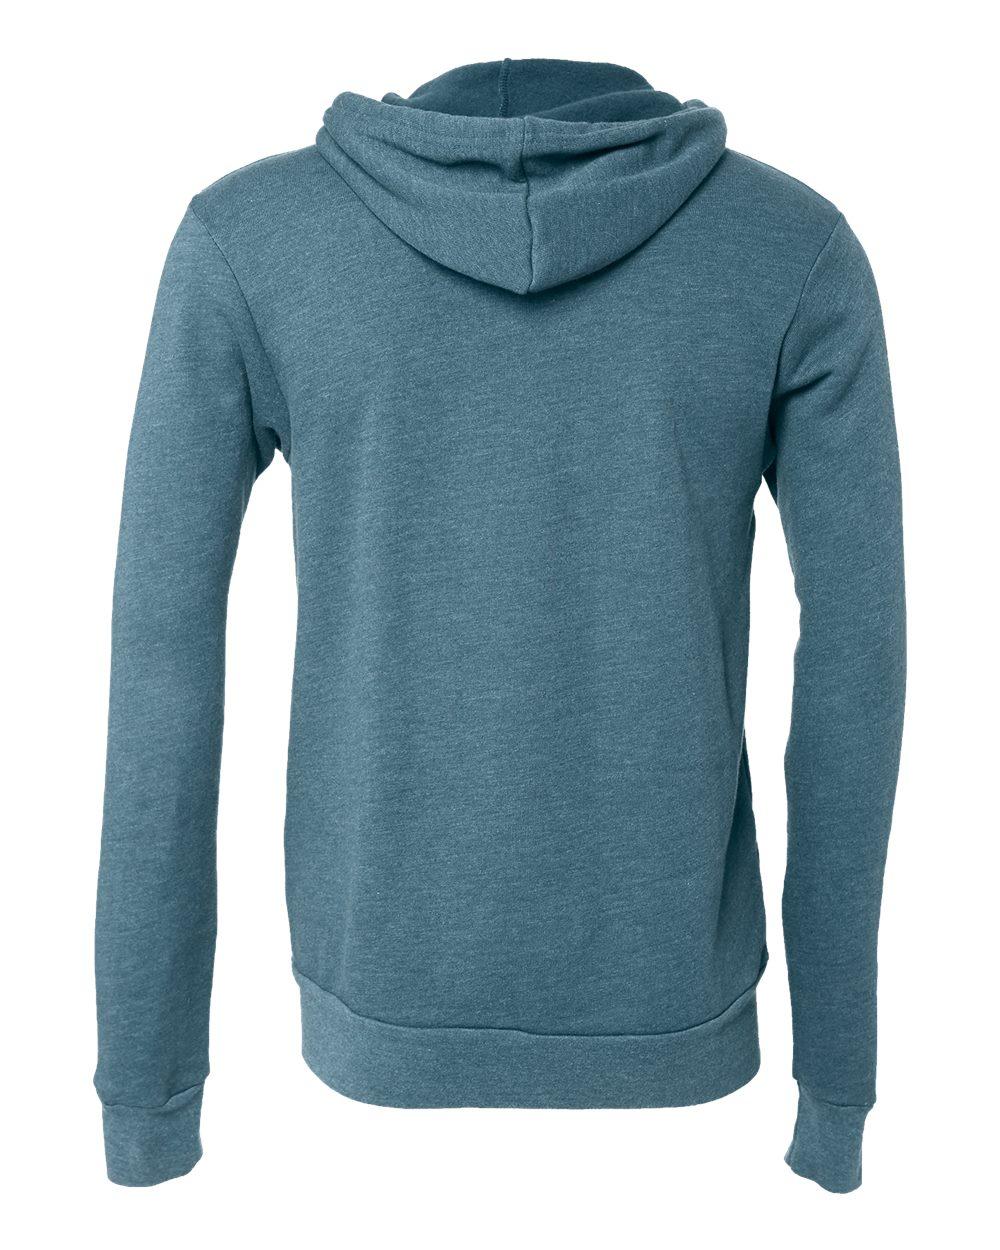 Bella-Canvas-Unisex-Full-Zip-Up-Hooded-Sweatshirt-Blank-Hoodie-3739-up-to-3XL thumbnail 36